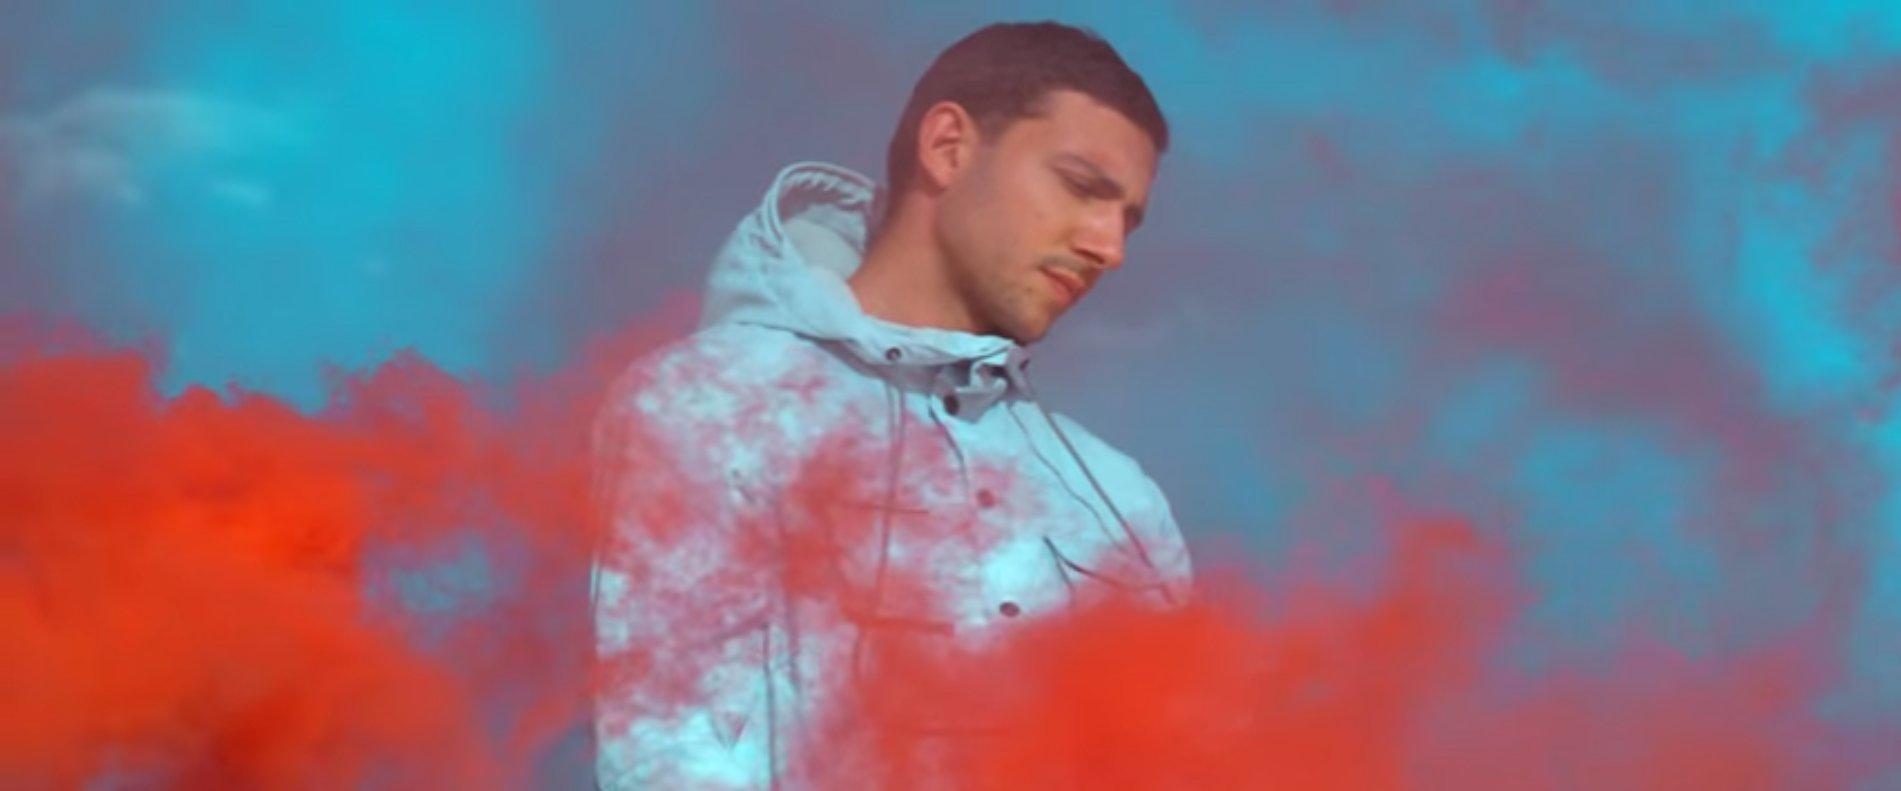 Majid Jordan – Phases Music Video